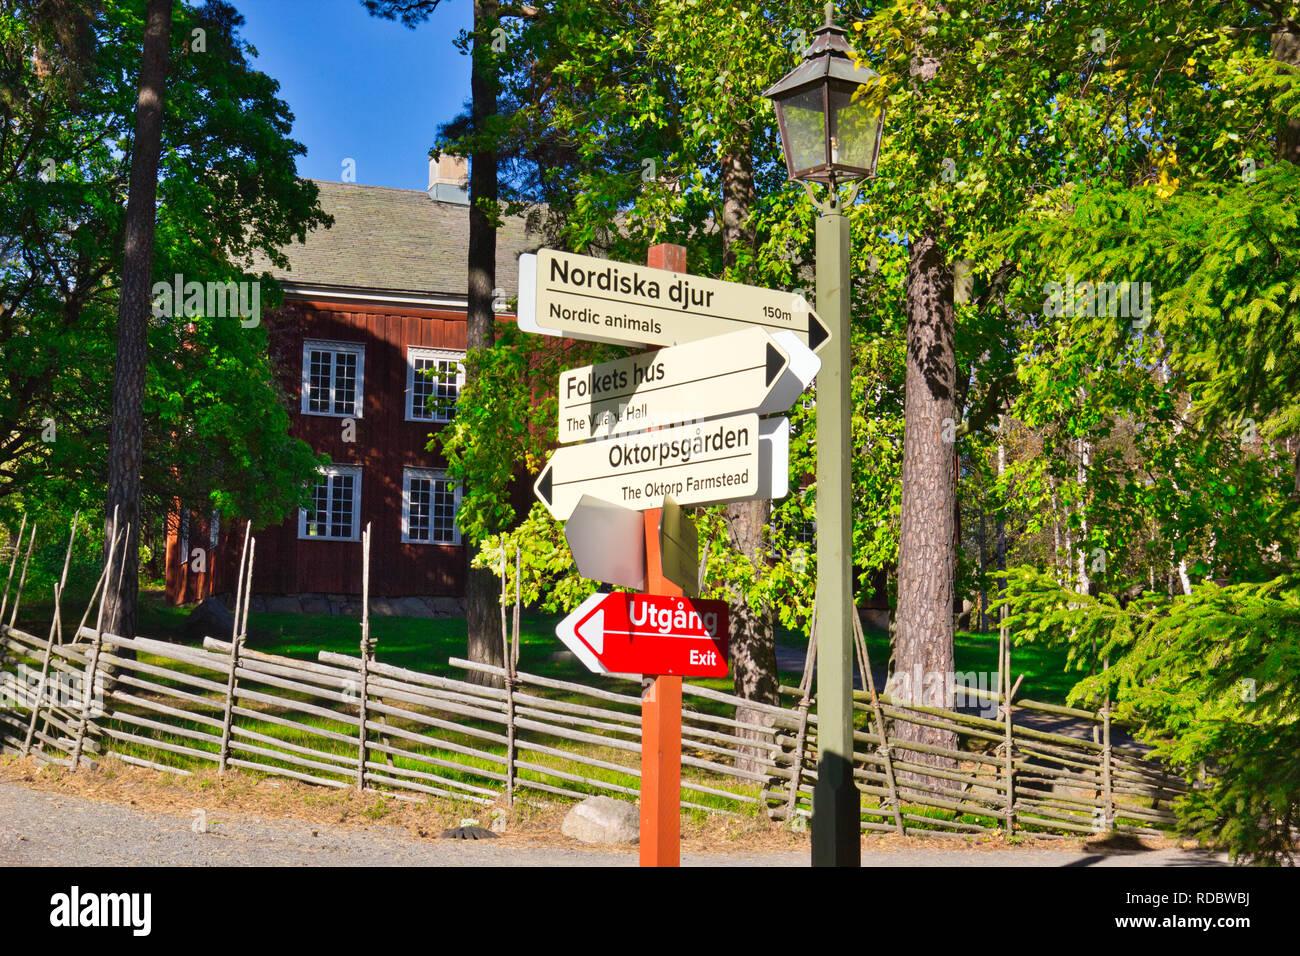 Tourist information and direction signs outside Eksharad Farm manor house, Skansen, Djurgarden, Stockholm, Sweden, Scandinavia - Stock Image